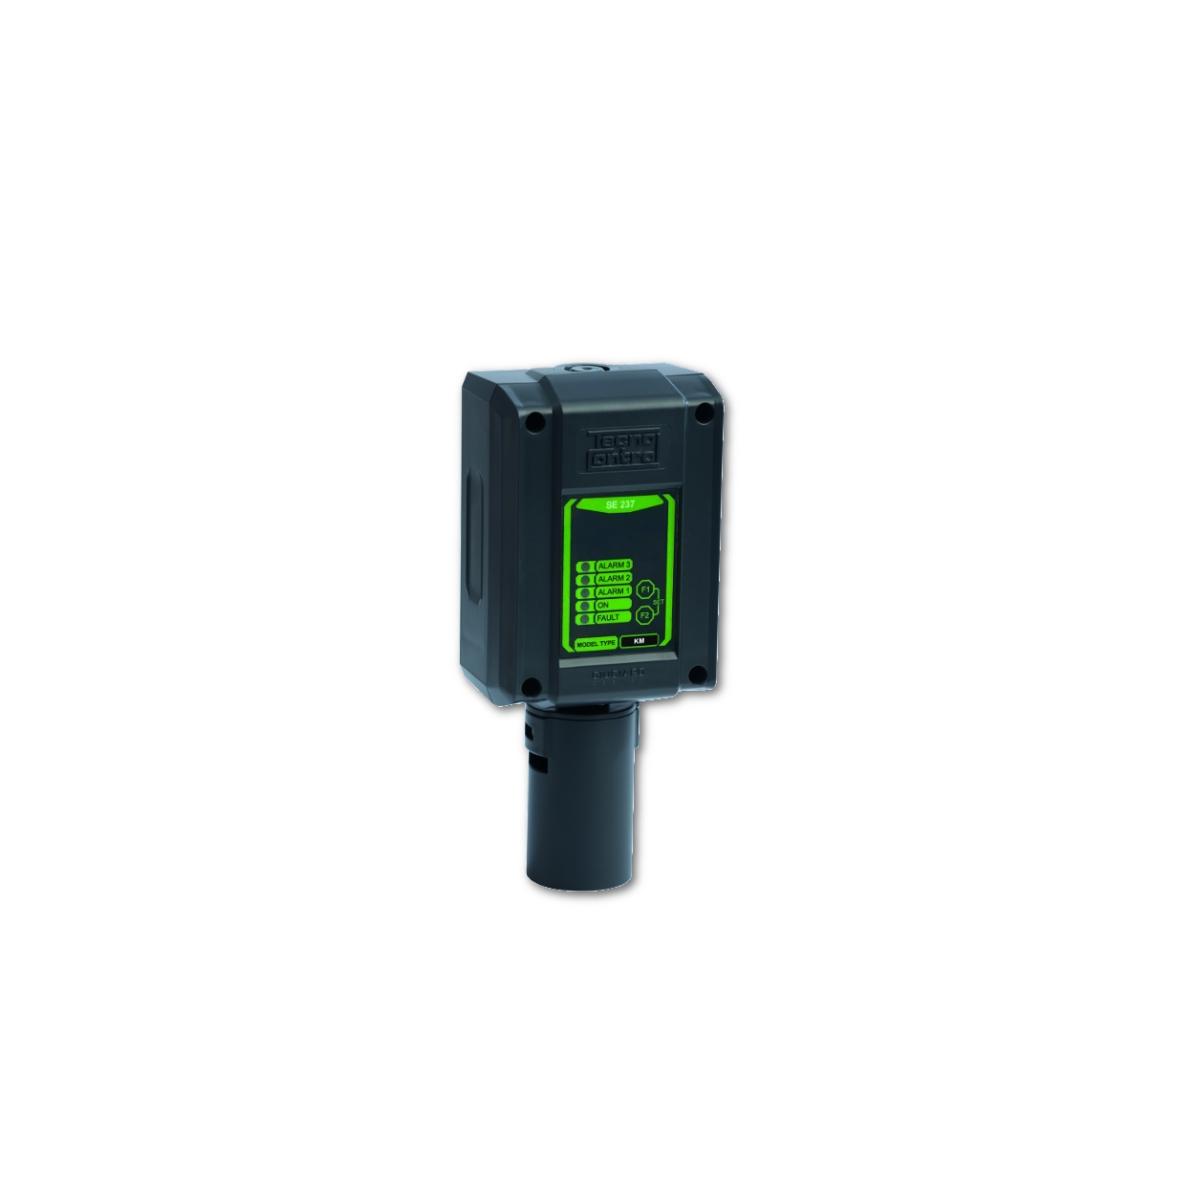 Detetor de Amonia IP65 OLYMPIA